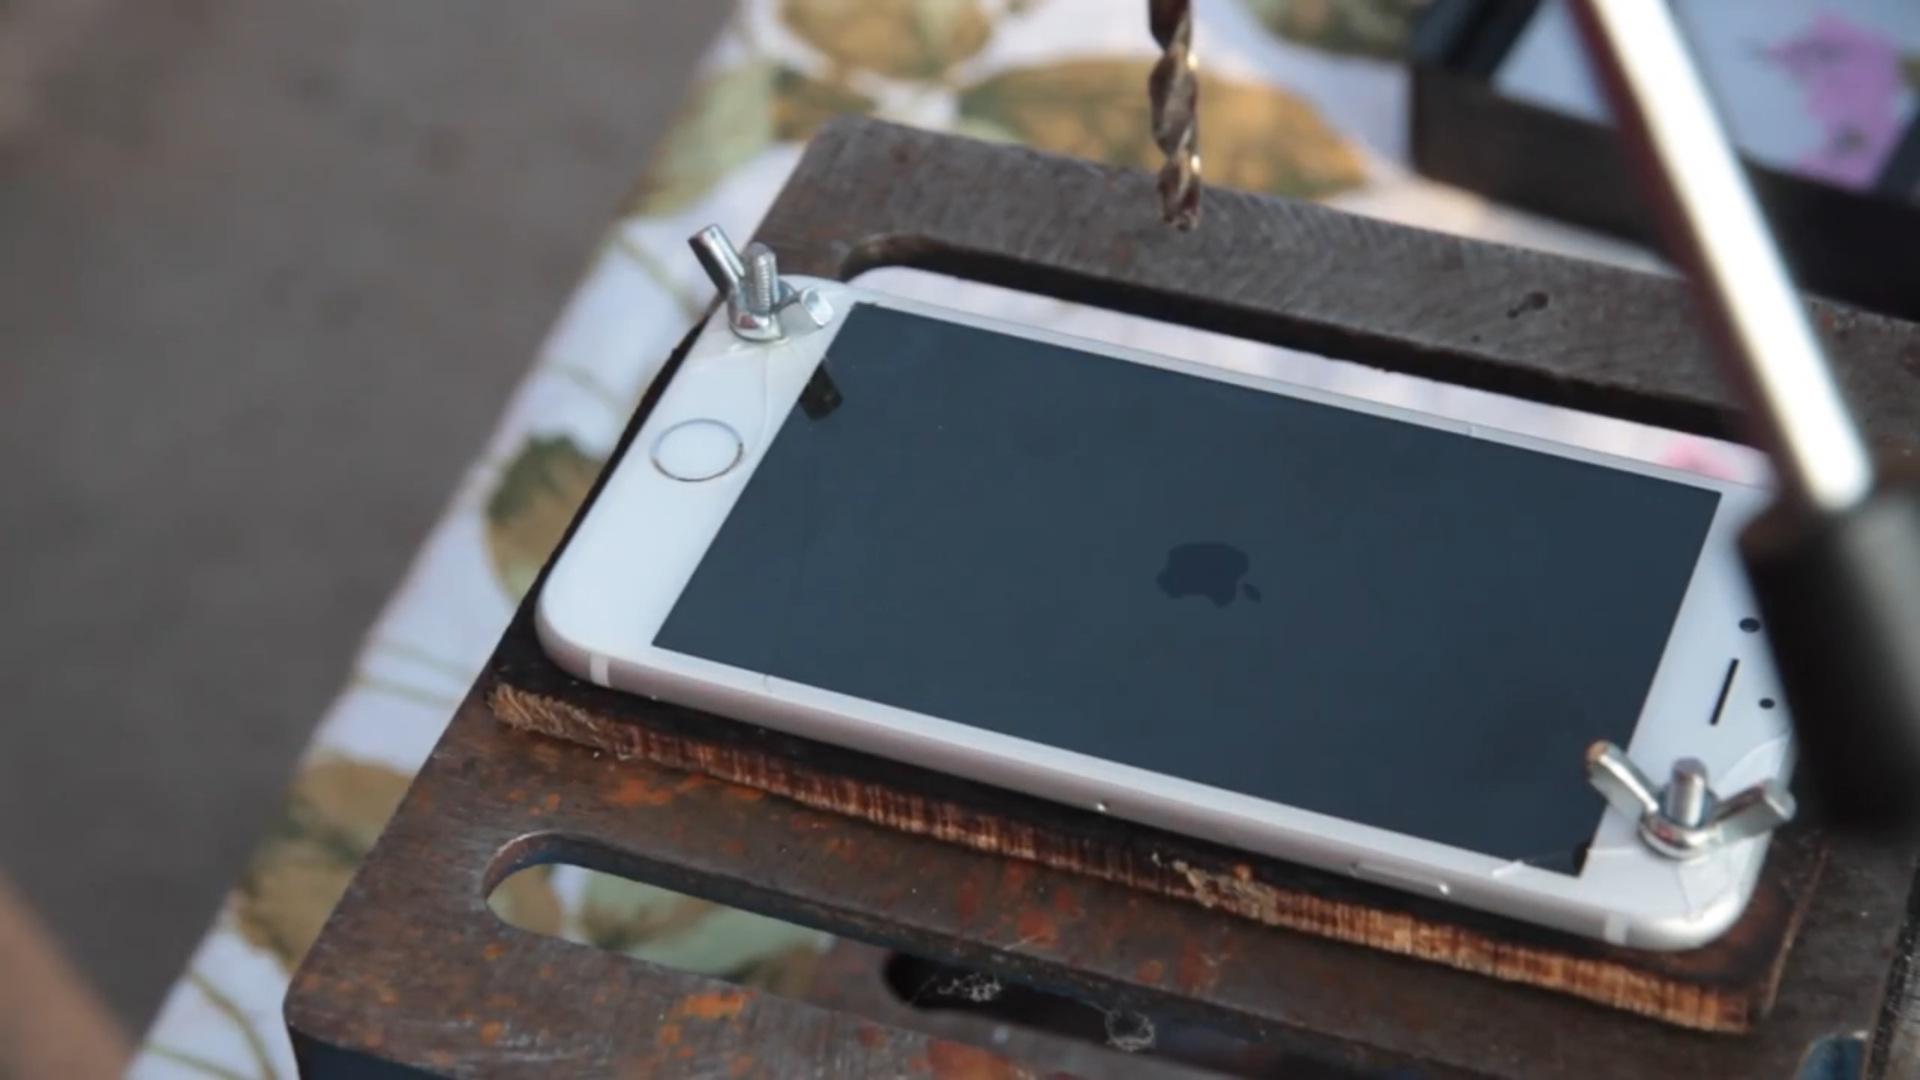 Bendgate solution iphone 6 (2)